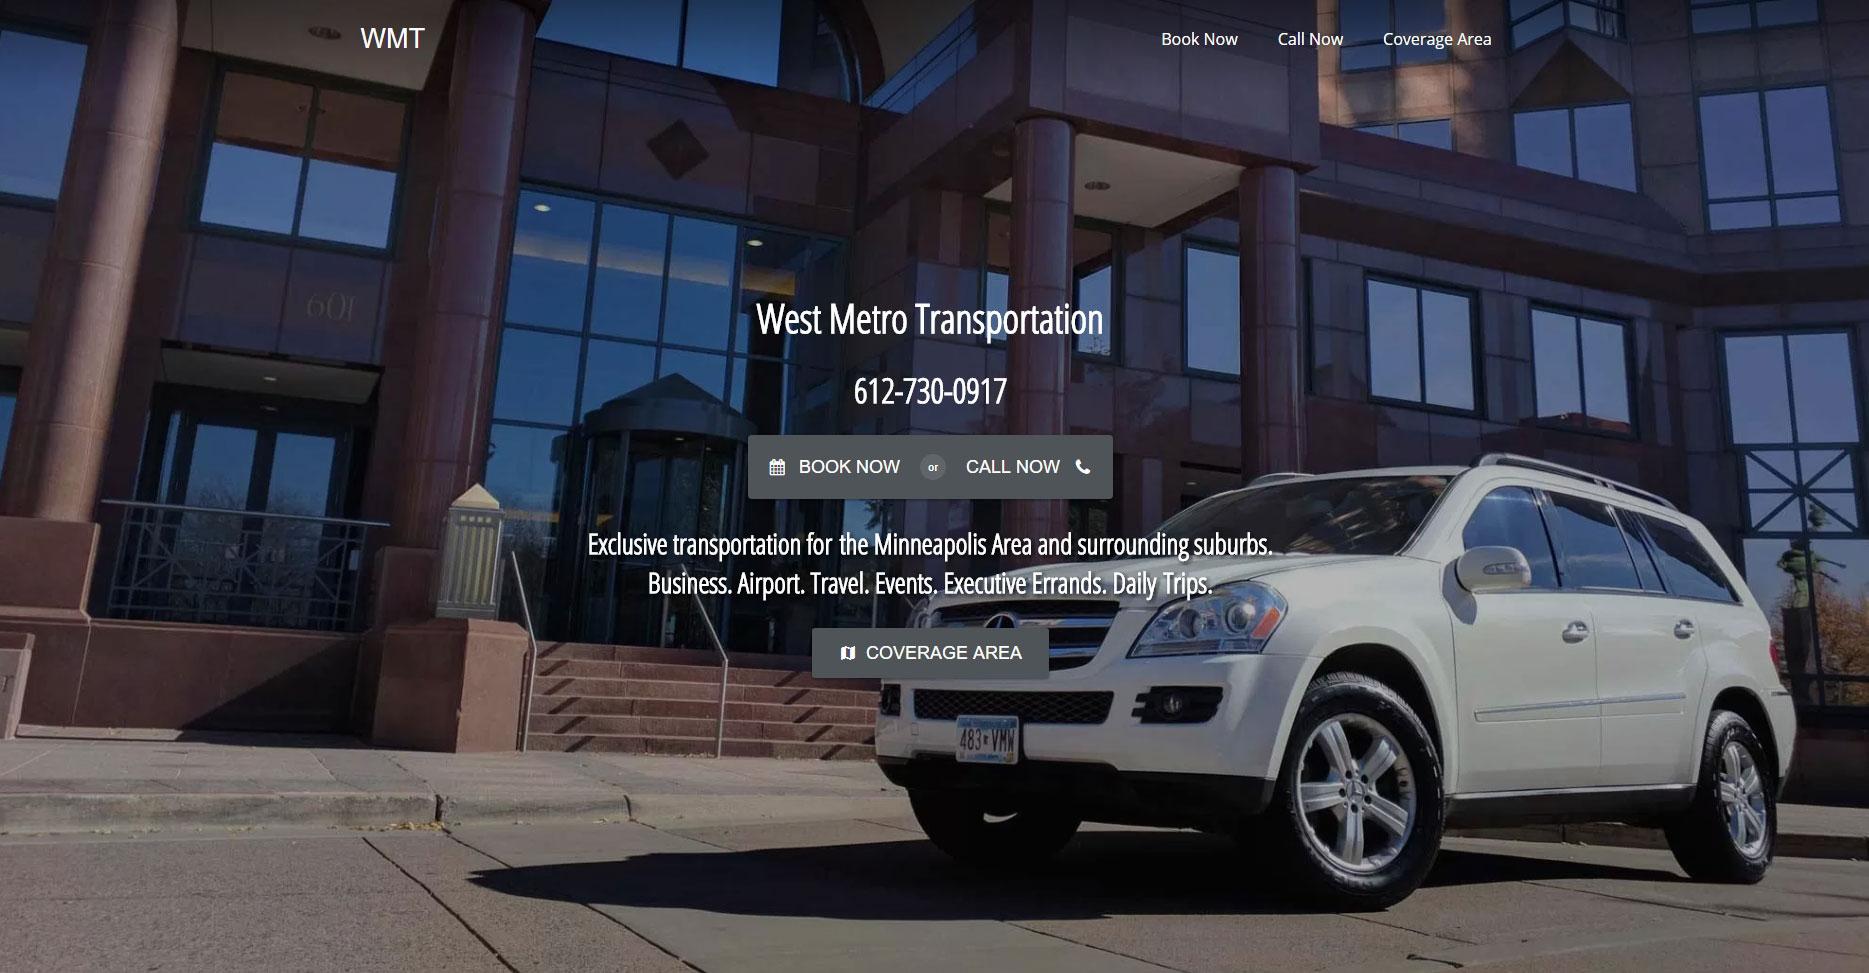 West Metro Transportation